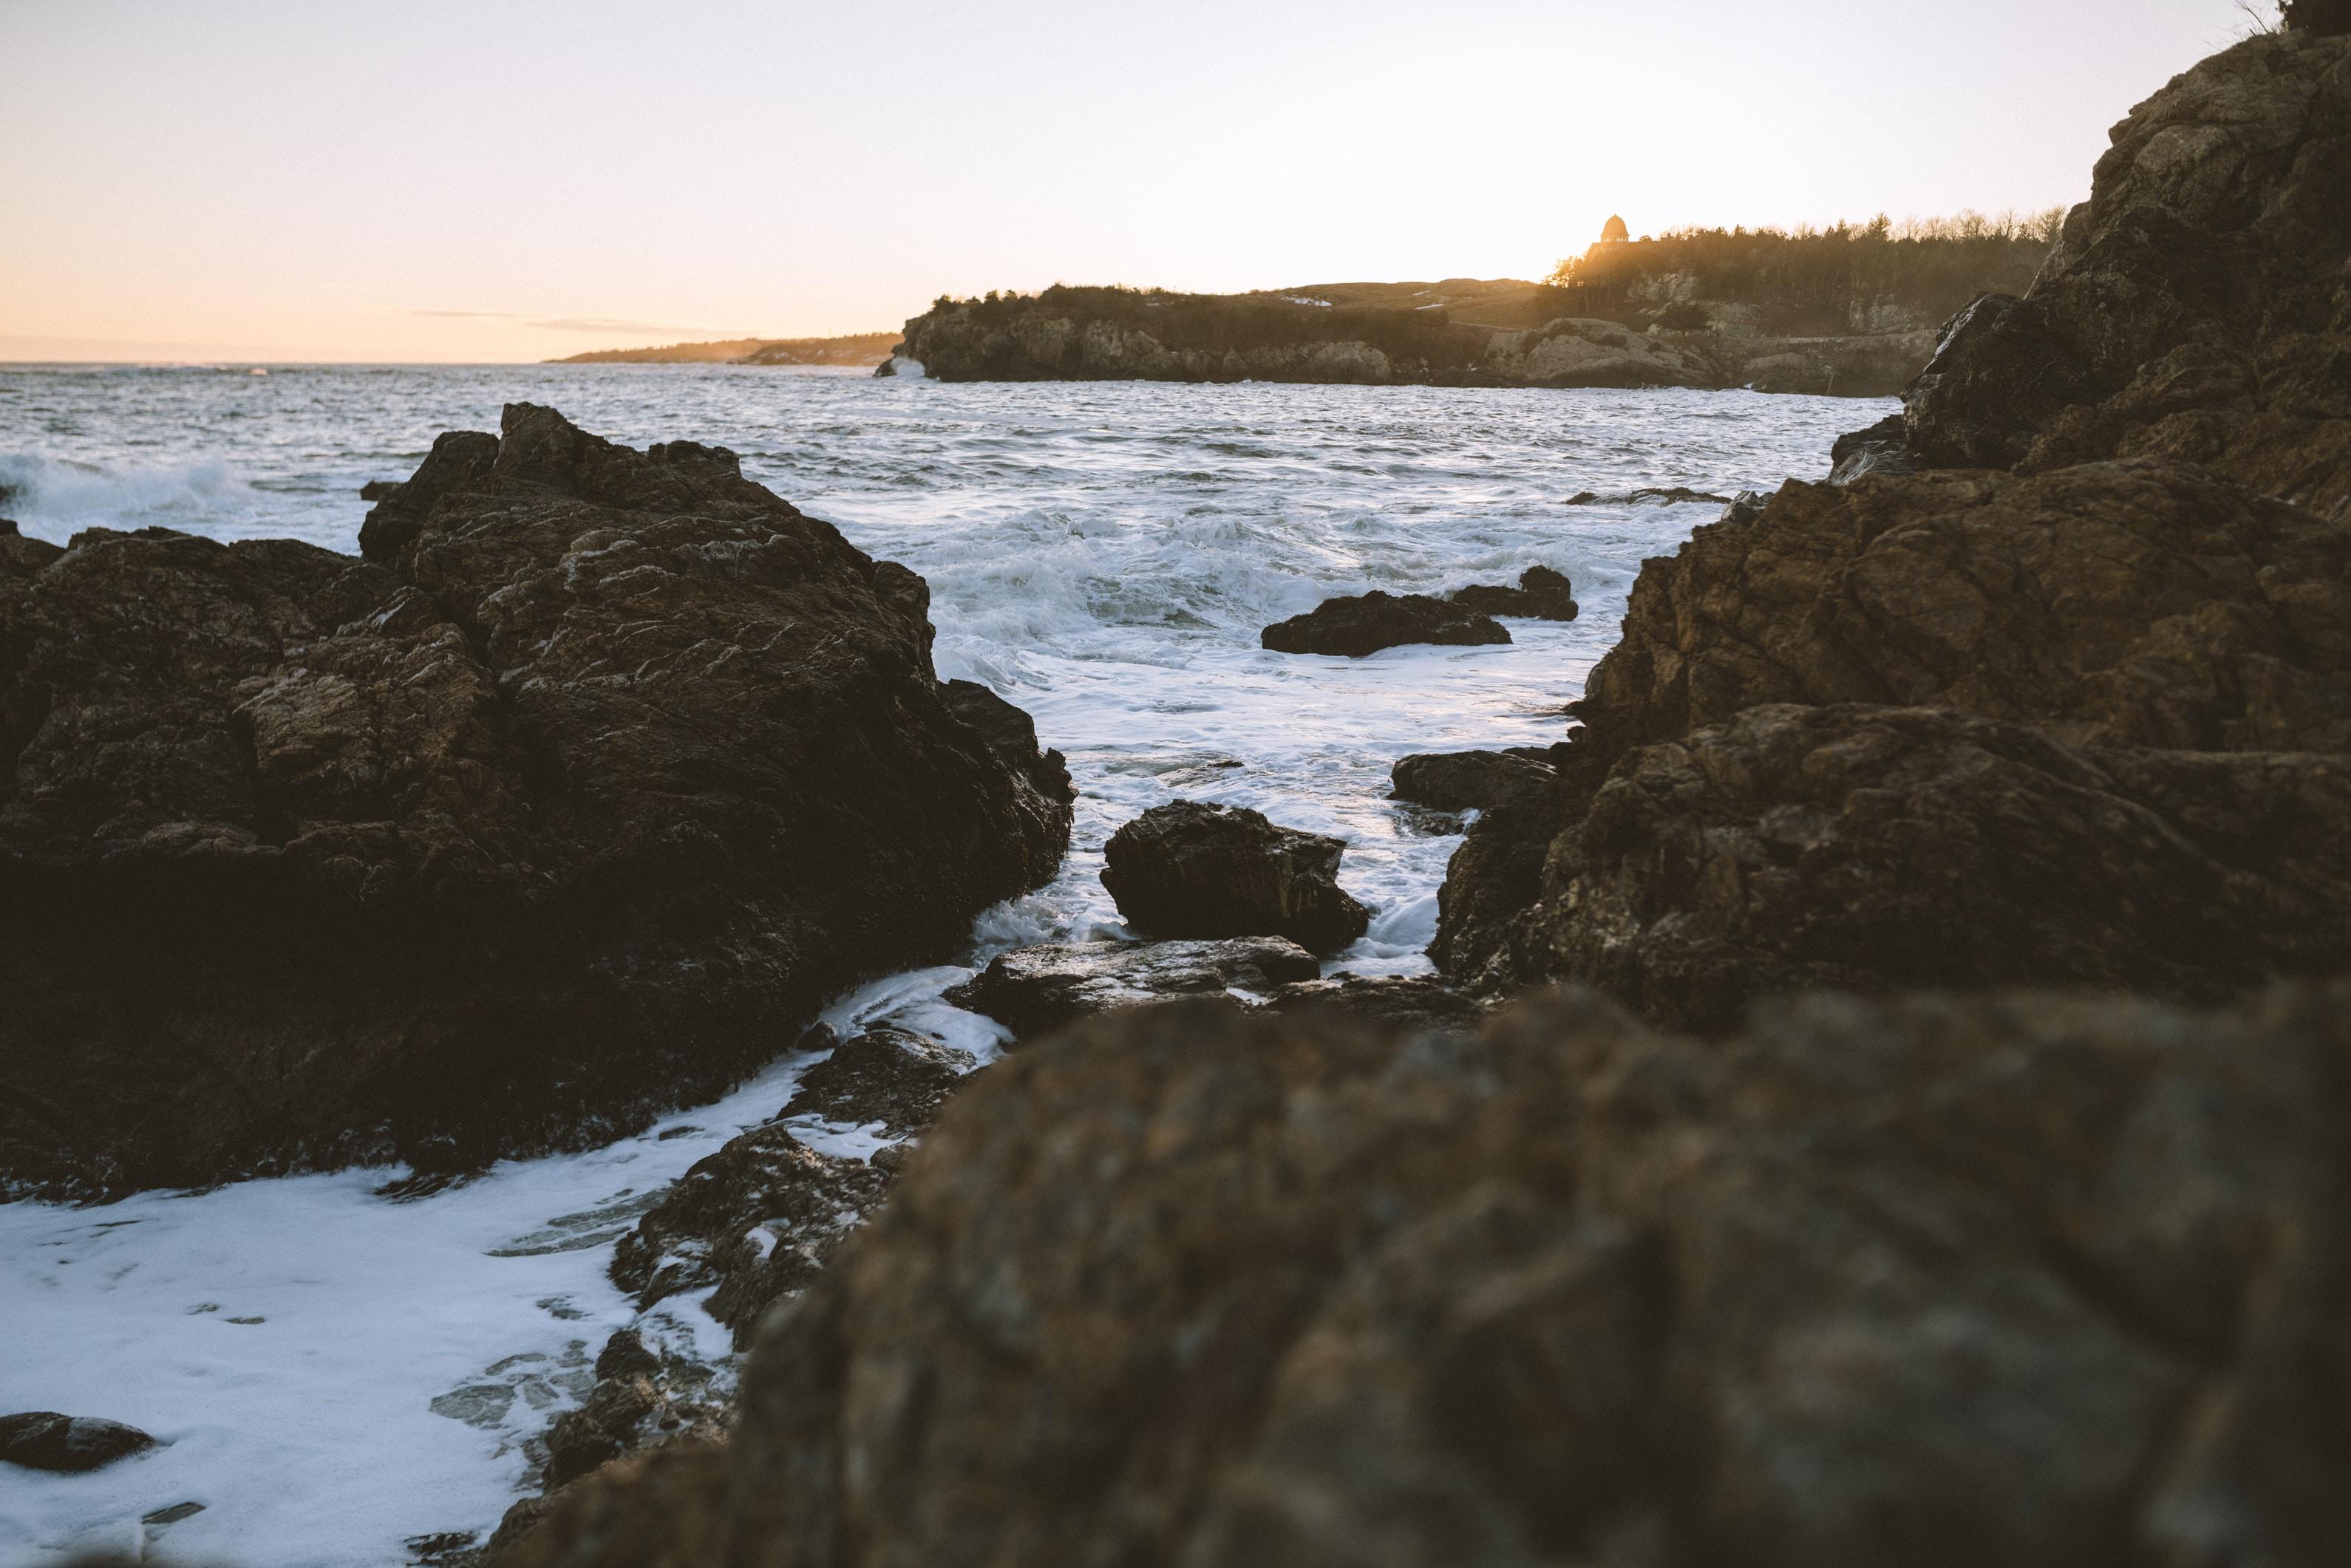 sea waves crashing to rocks